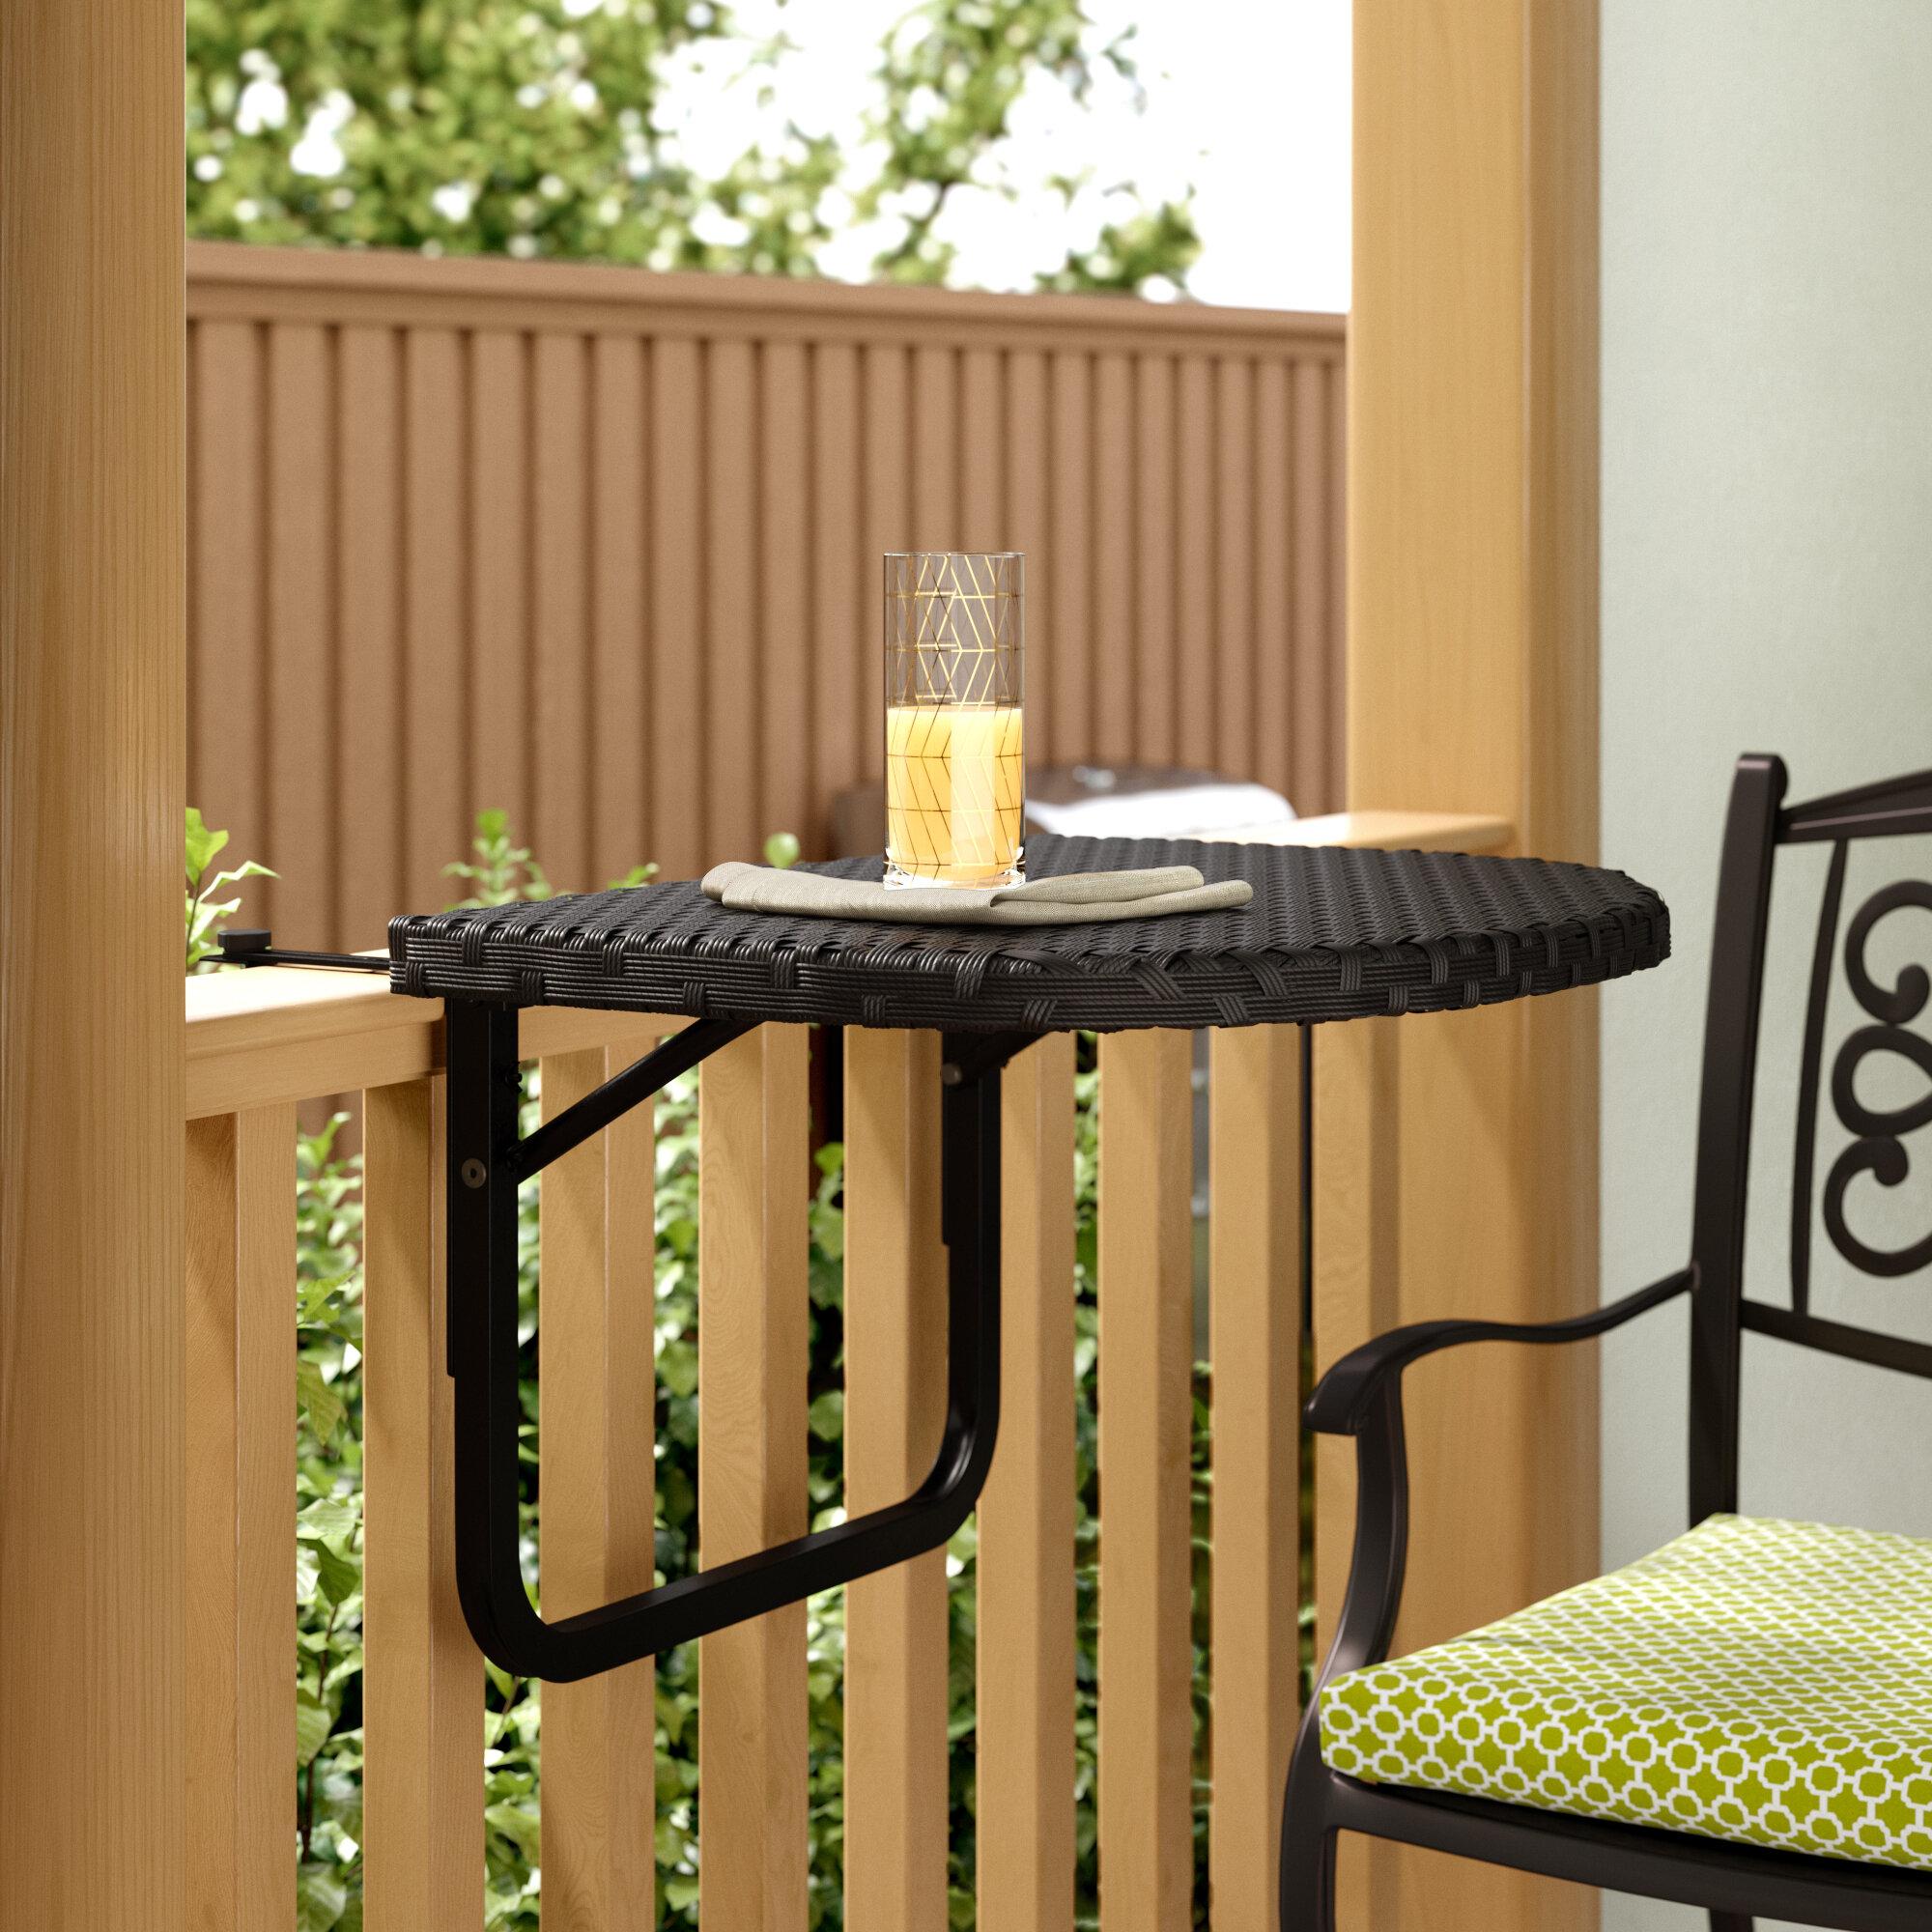 Ebern Designs Cropsey Wicker Rattan Balcony Table Reviews Wayfair